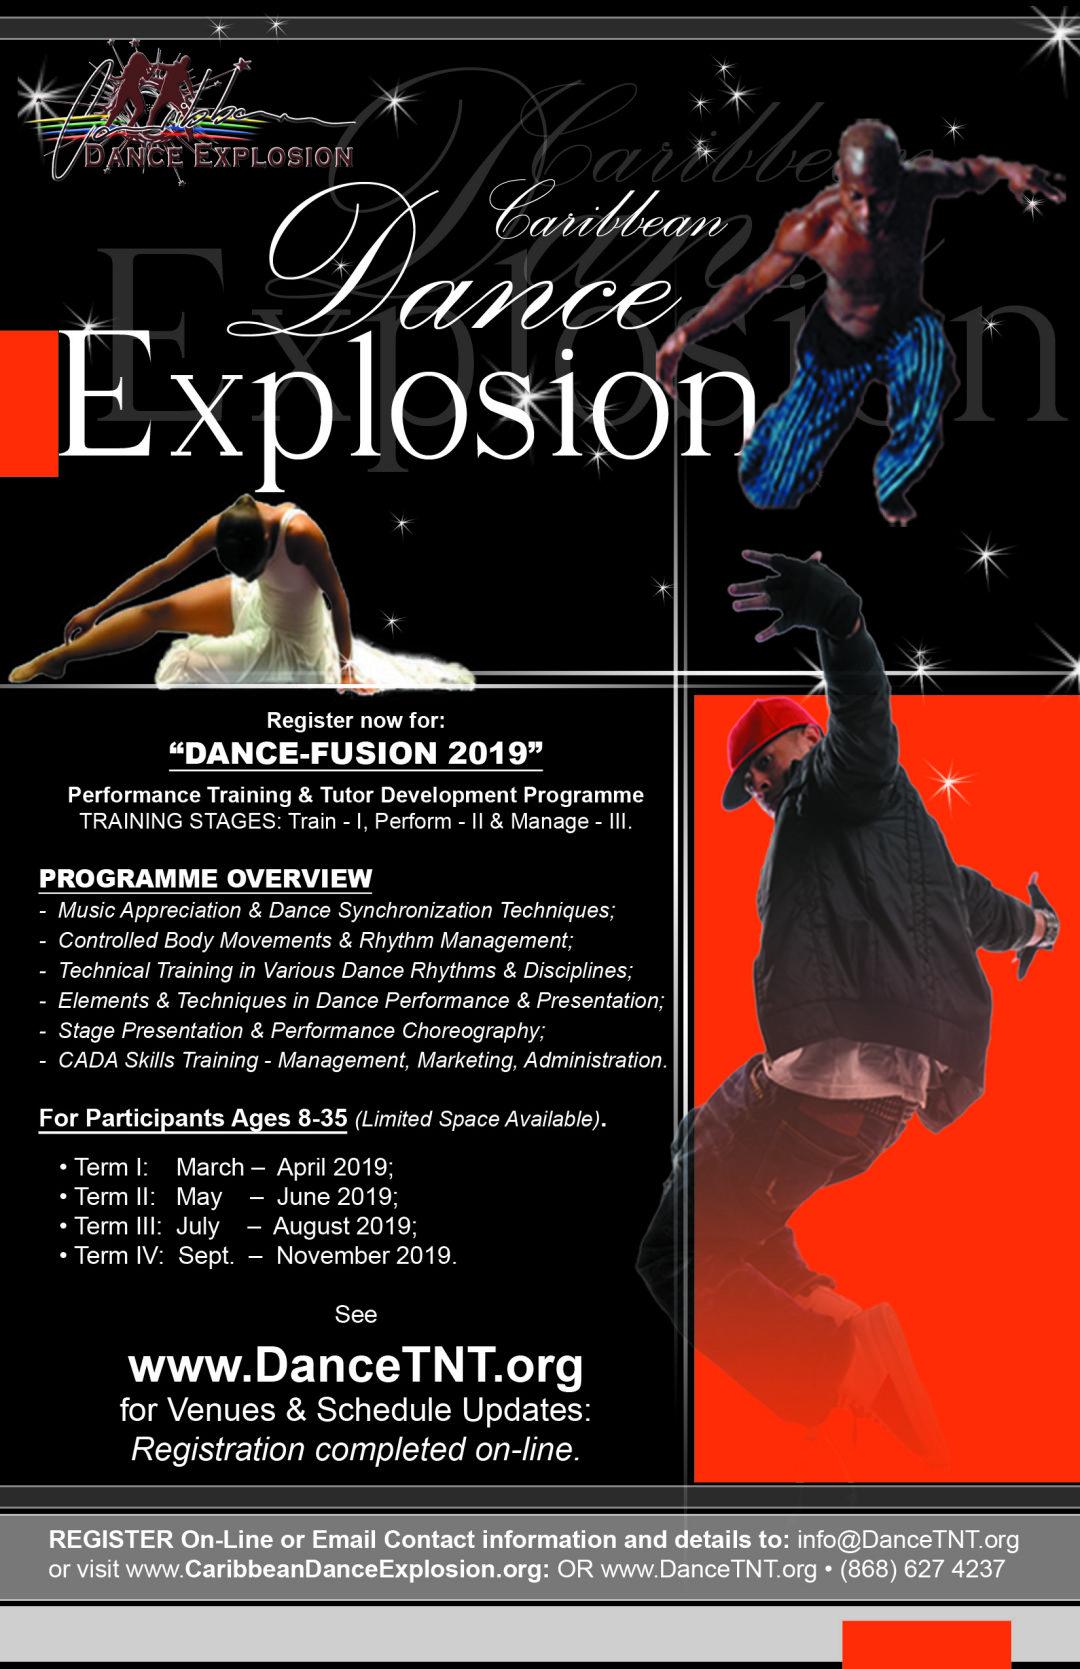 Register for Dance Fusion